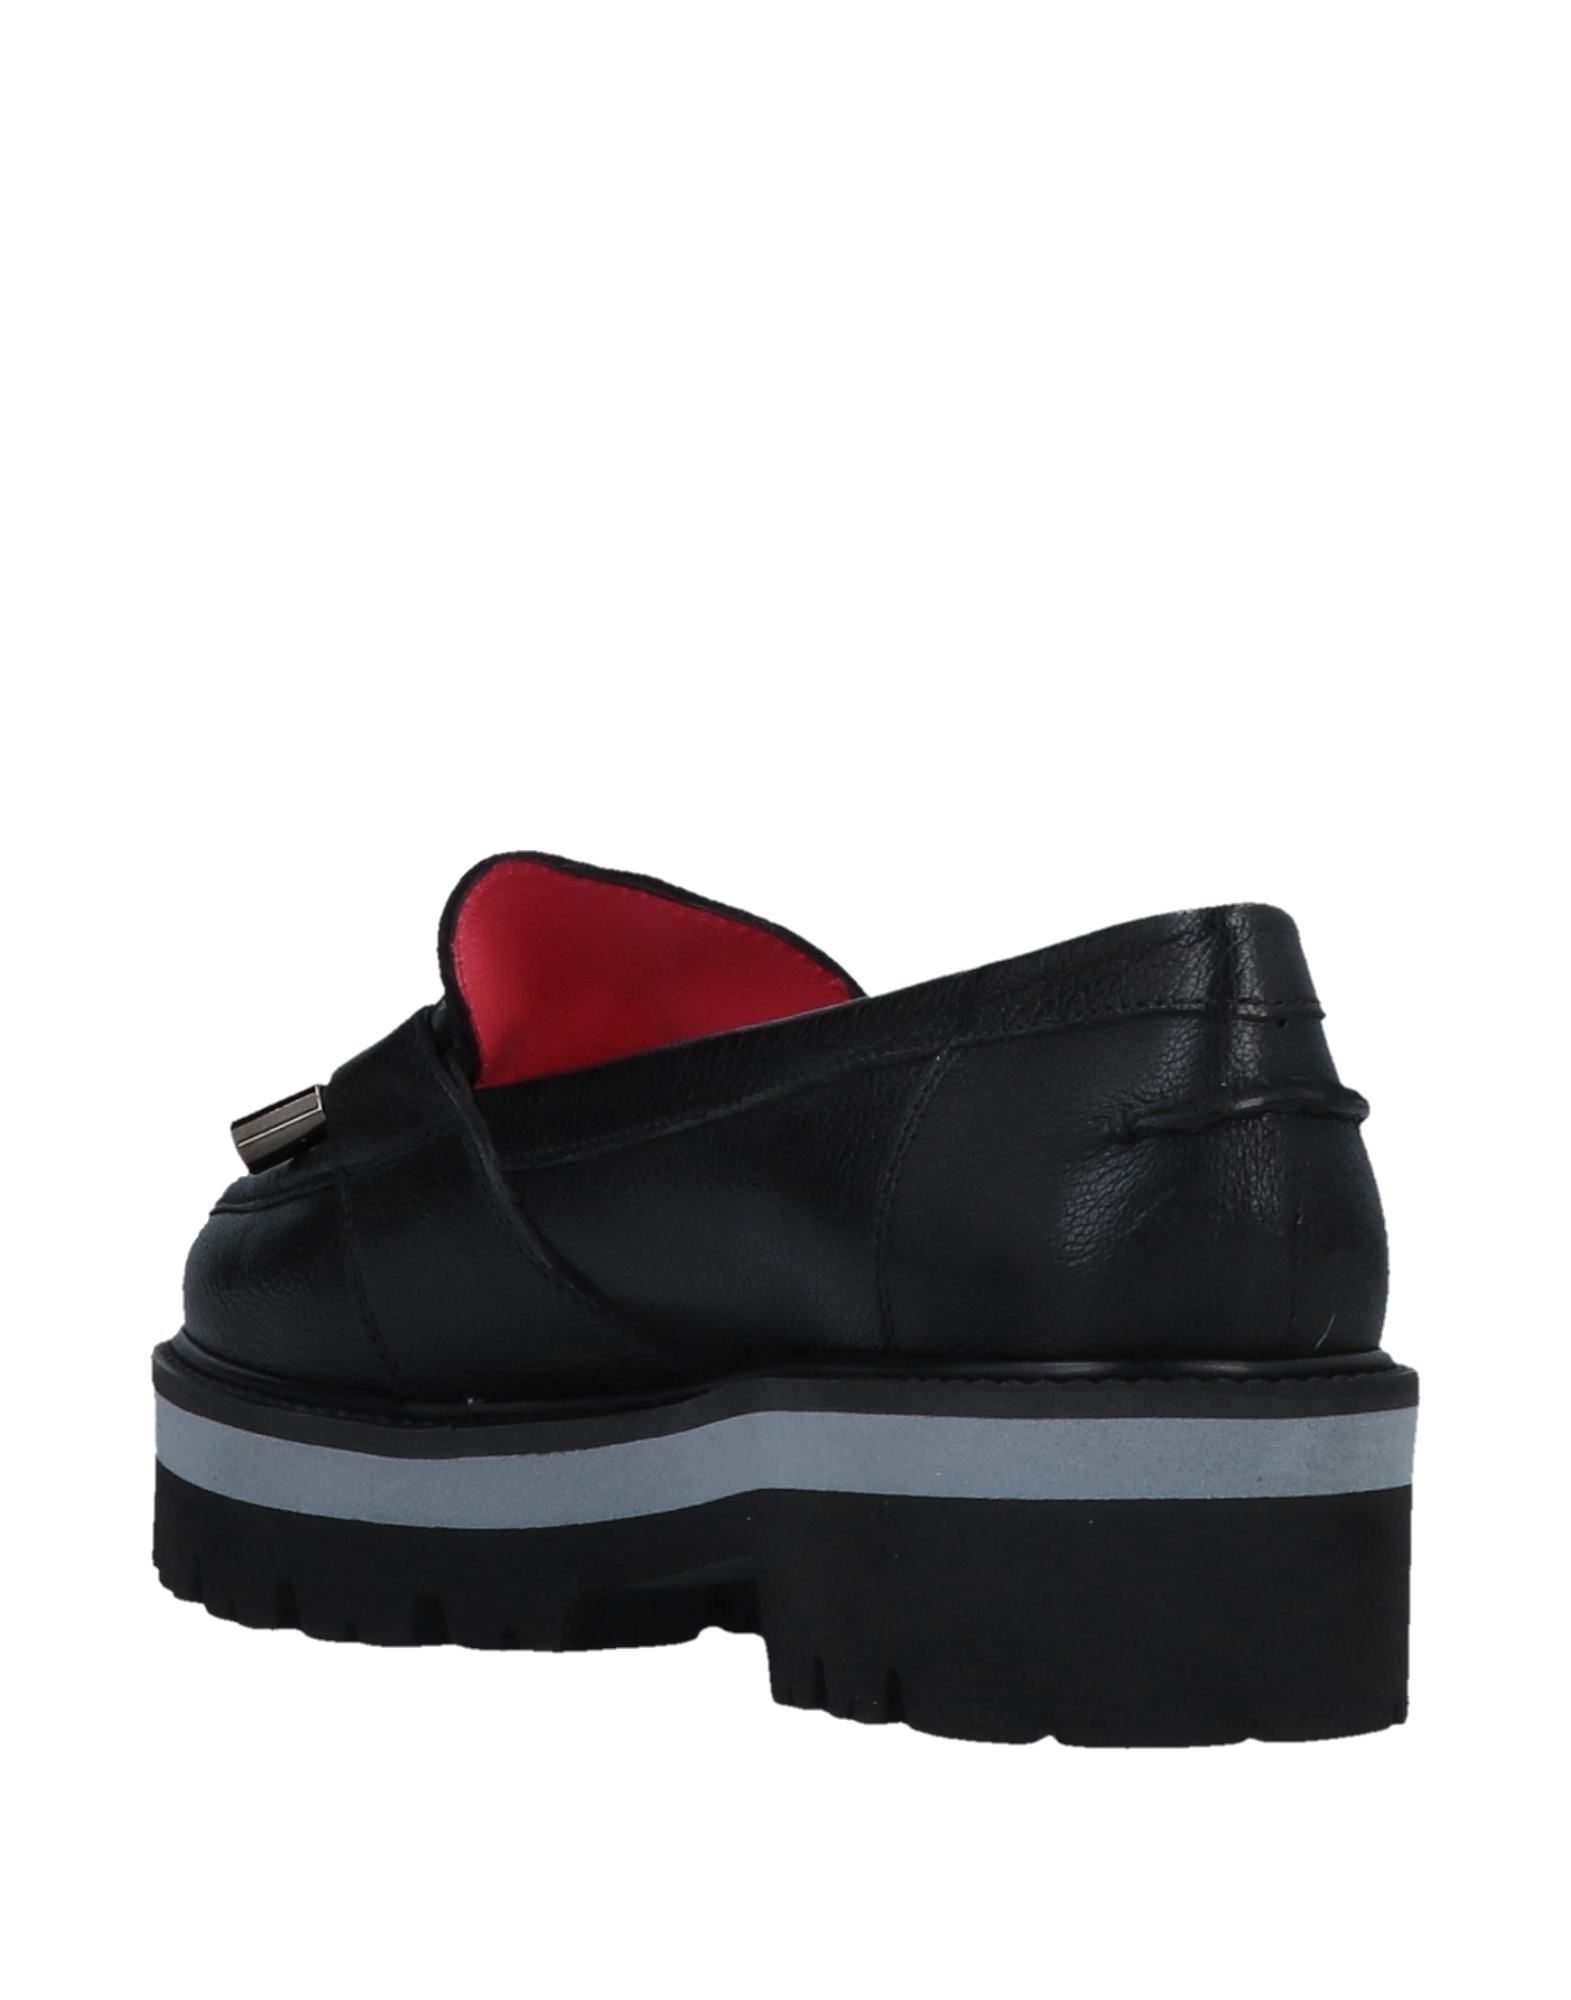 Stilvolle billige Mokassins Schuhe Pas De Rouge Mokassins billige Damen  11510785QS 9f11c3